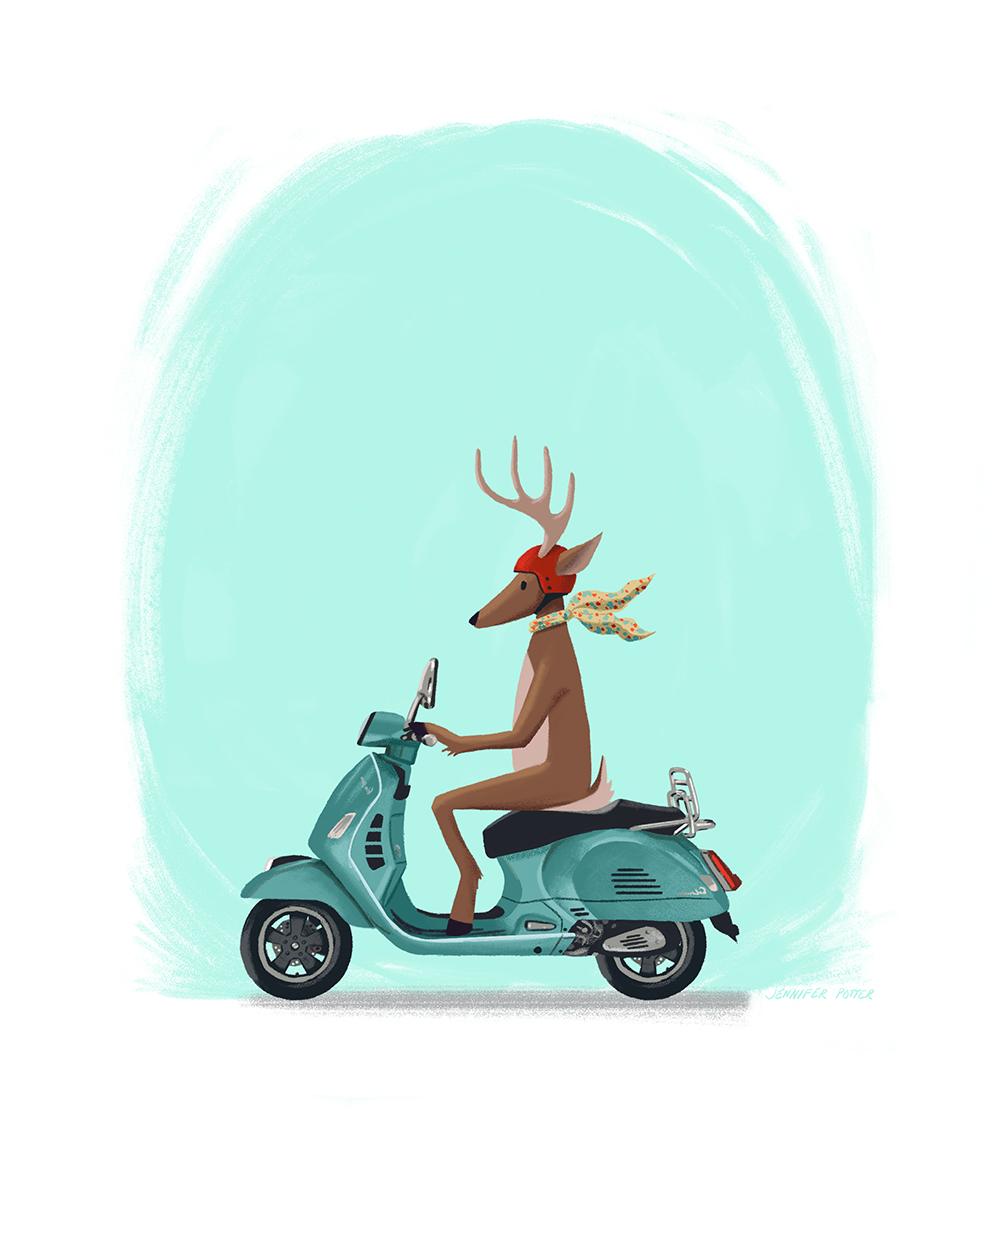 drivingAnimals_Deer_FINAL.jpg